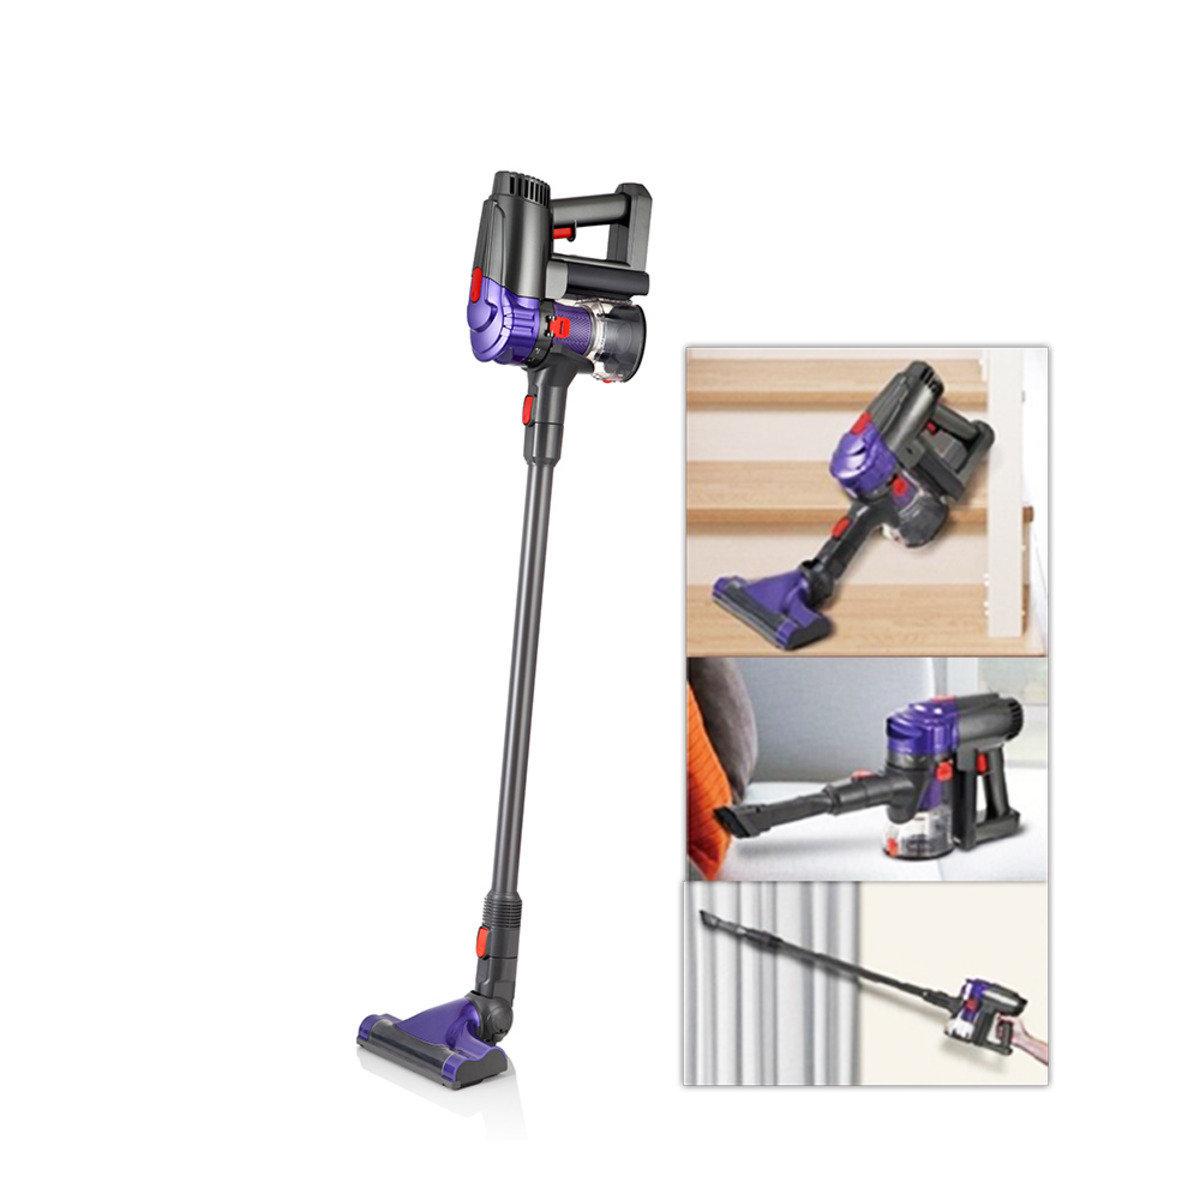 Cordless Cyclonic Stick Vacuum - CL-2200